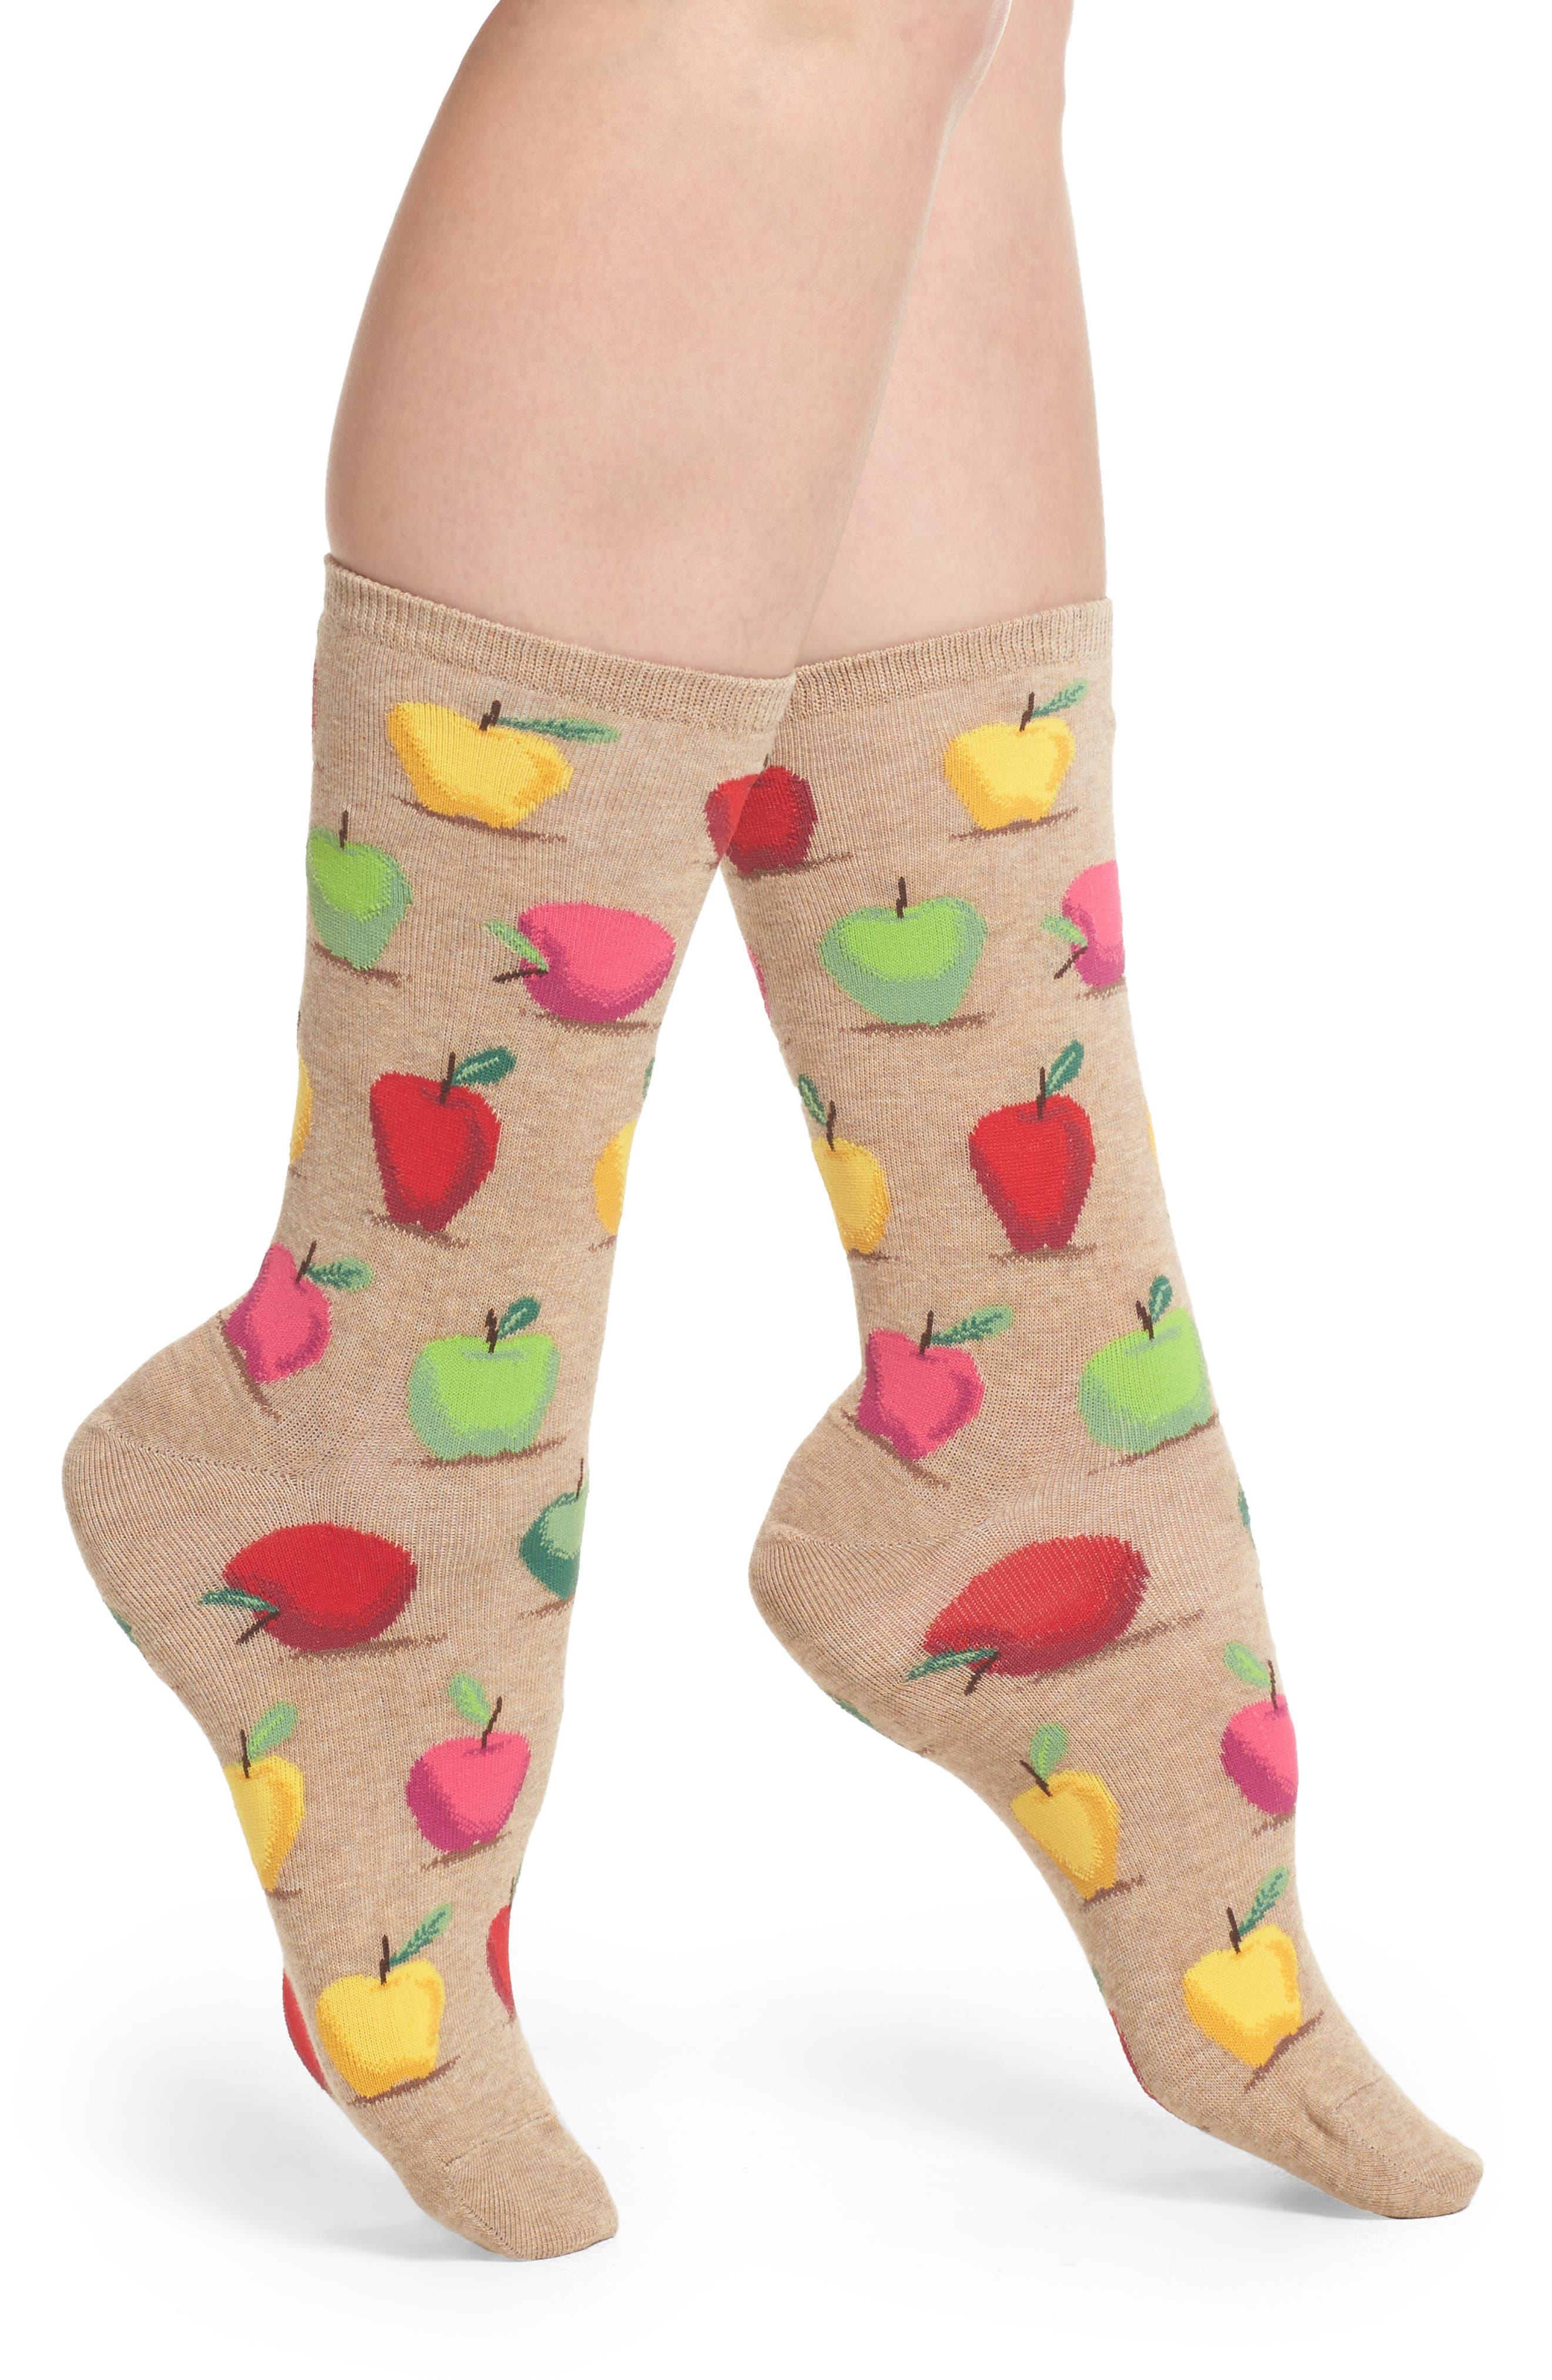 Hot Sox Apples Crew Socks (3 for $15)